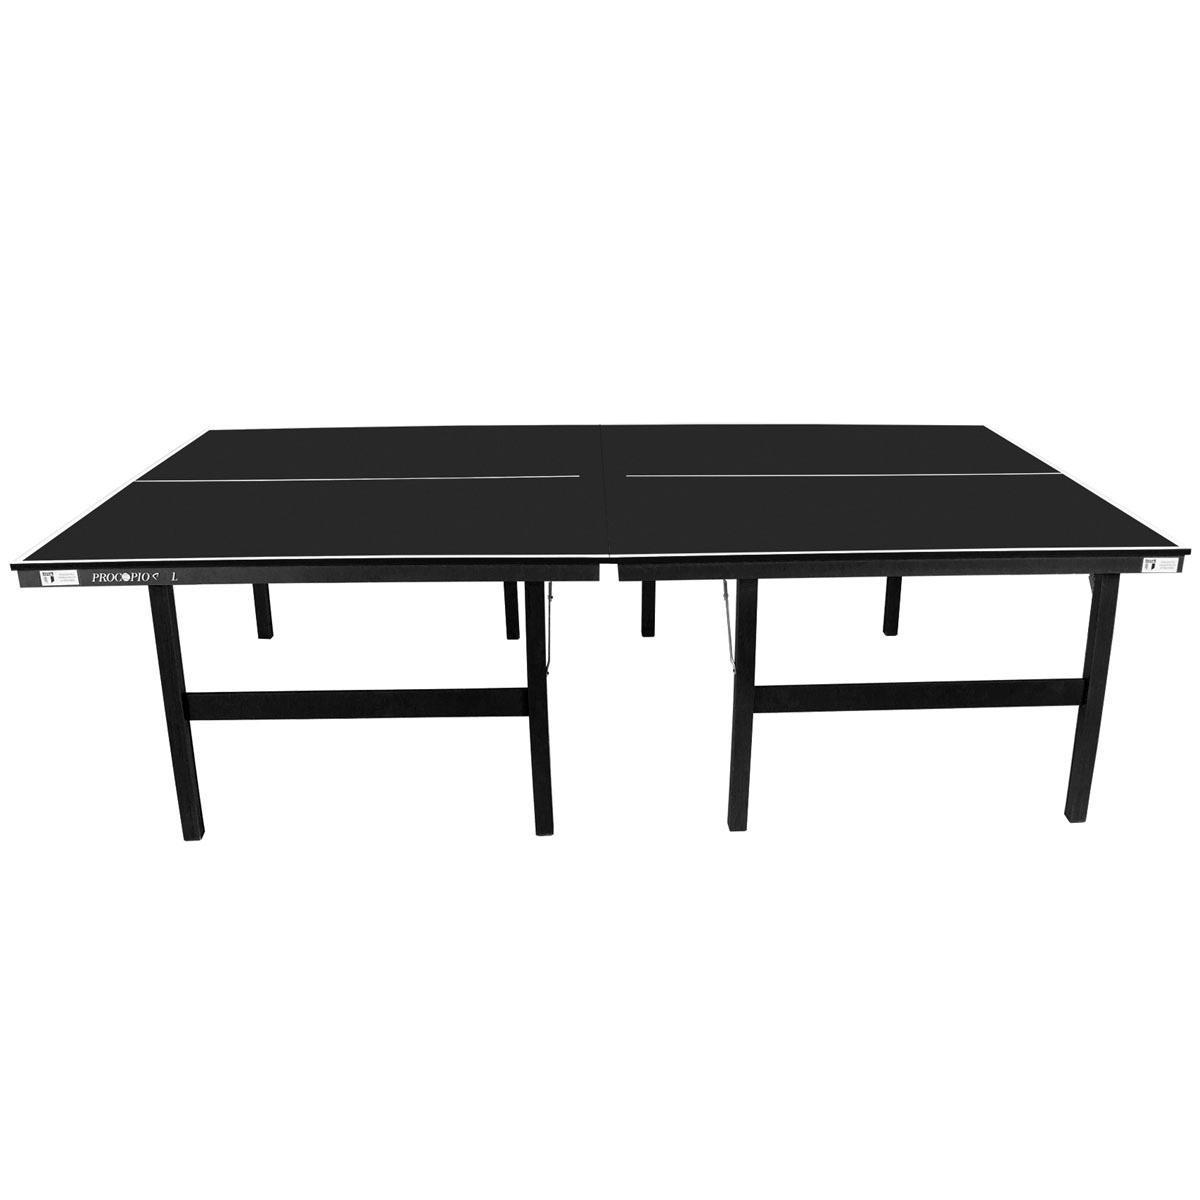 Tênis De Mesa Oficial Ping Pong MDF 15mm Luxo Procópio - Jogos de ... 9ee9a8f1935d2